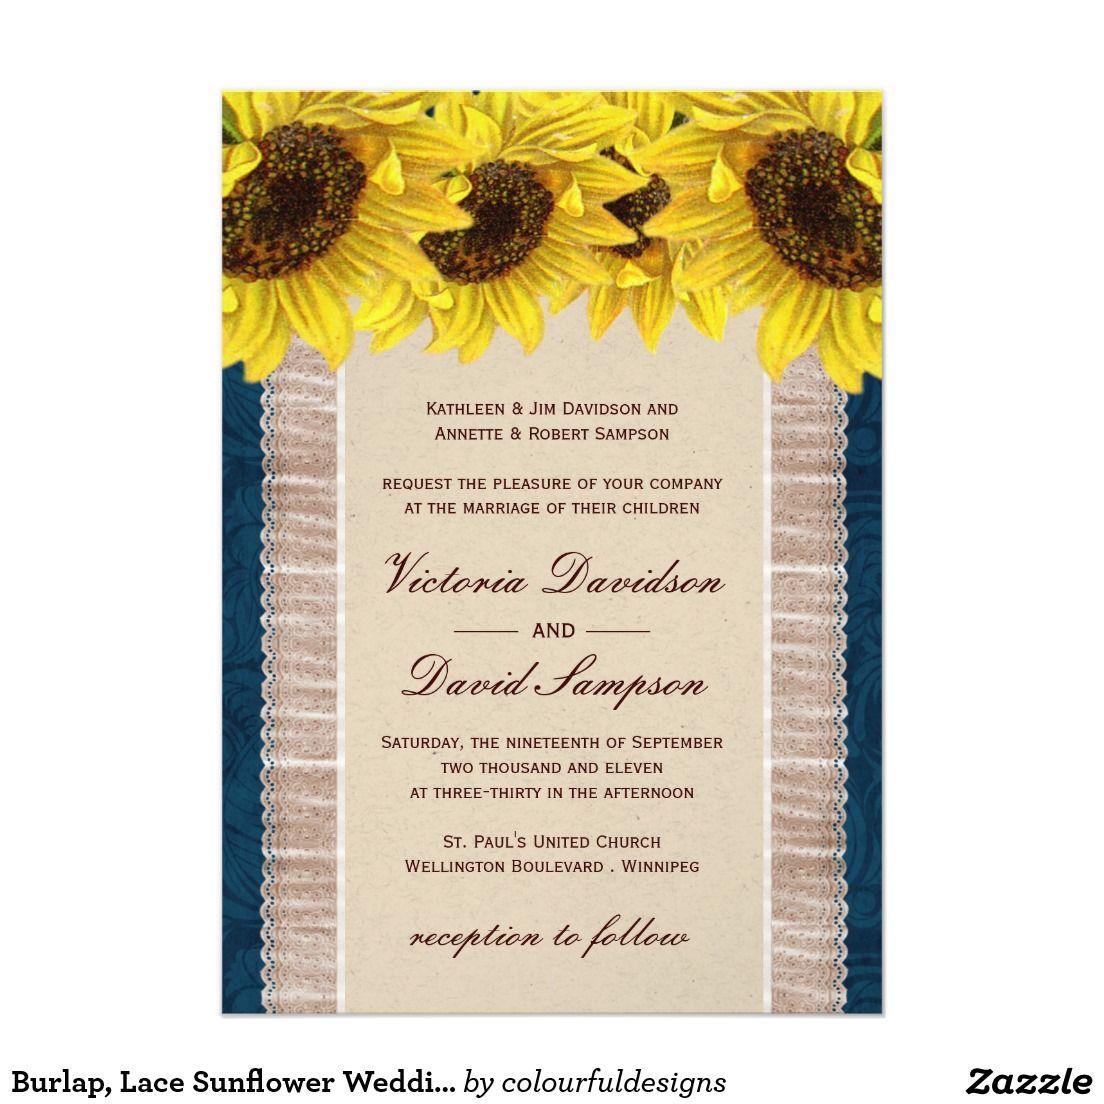 Burlap, Lace Sunflower Wedding Invitation | Sunflower wedding ...